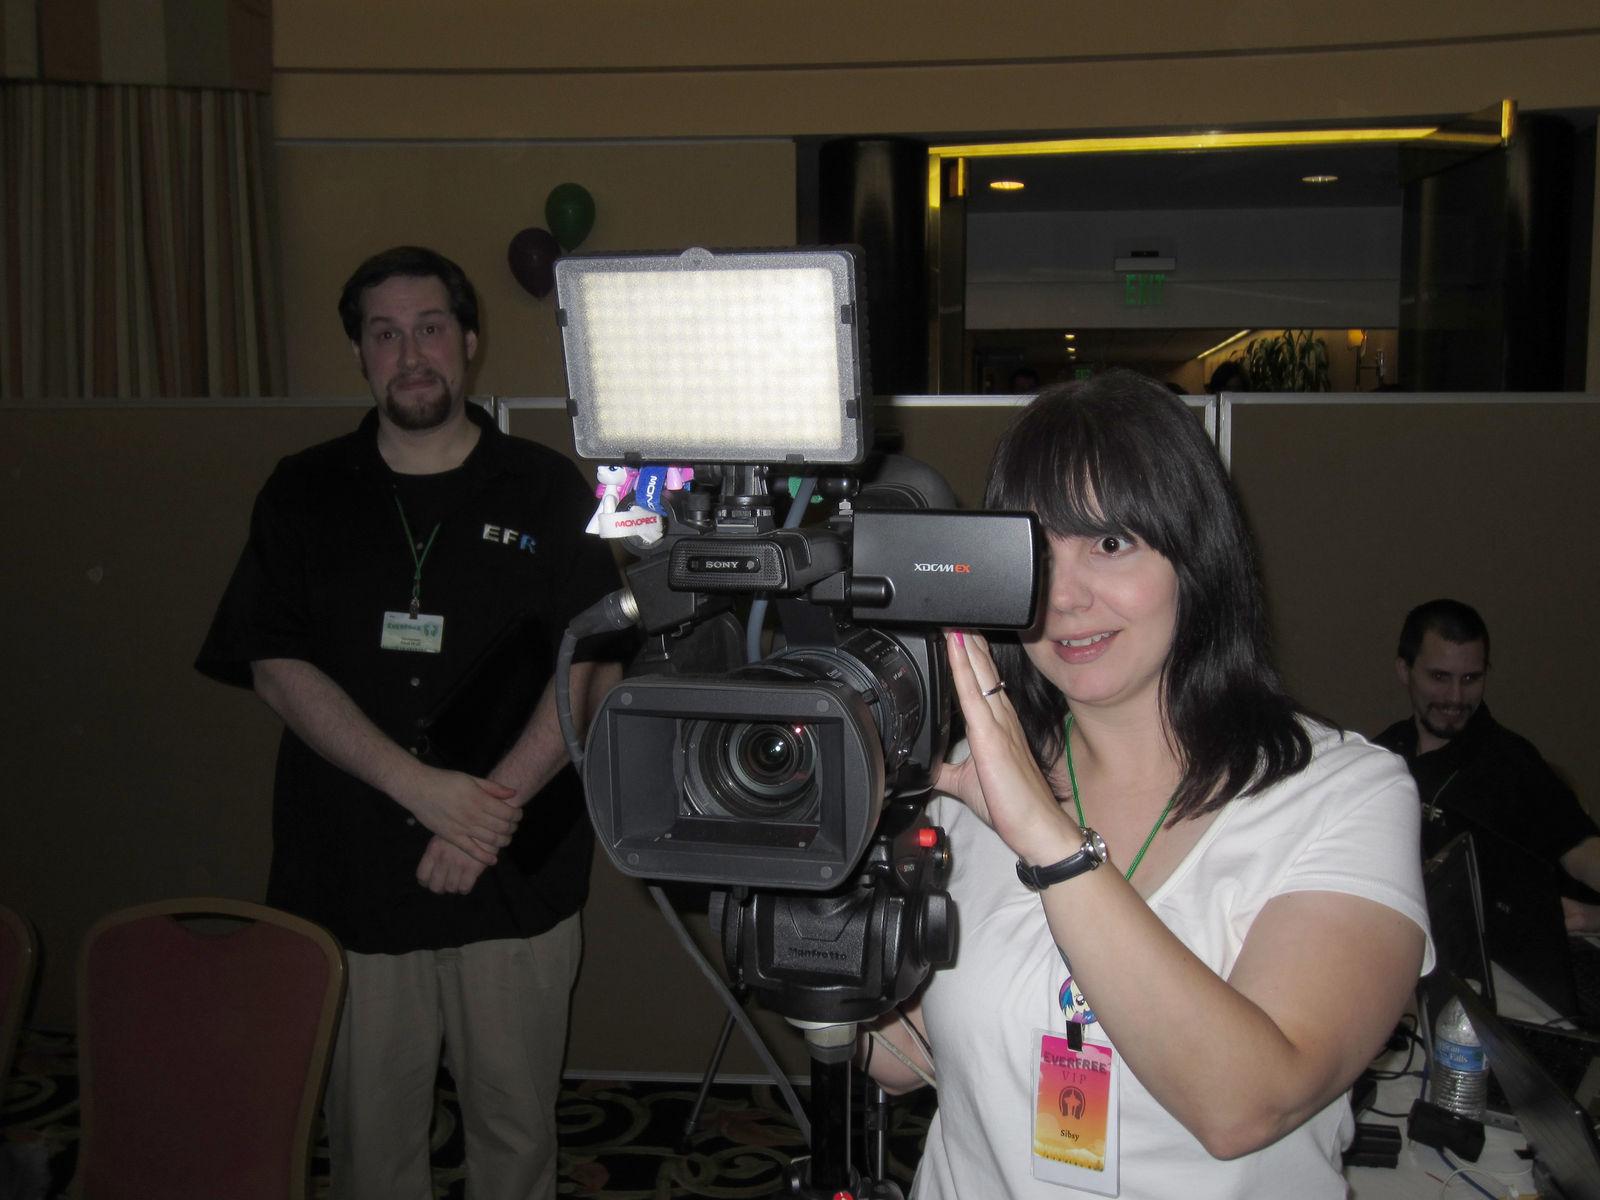 Sibsy the Cameramare